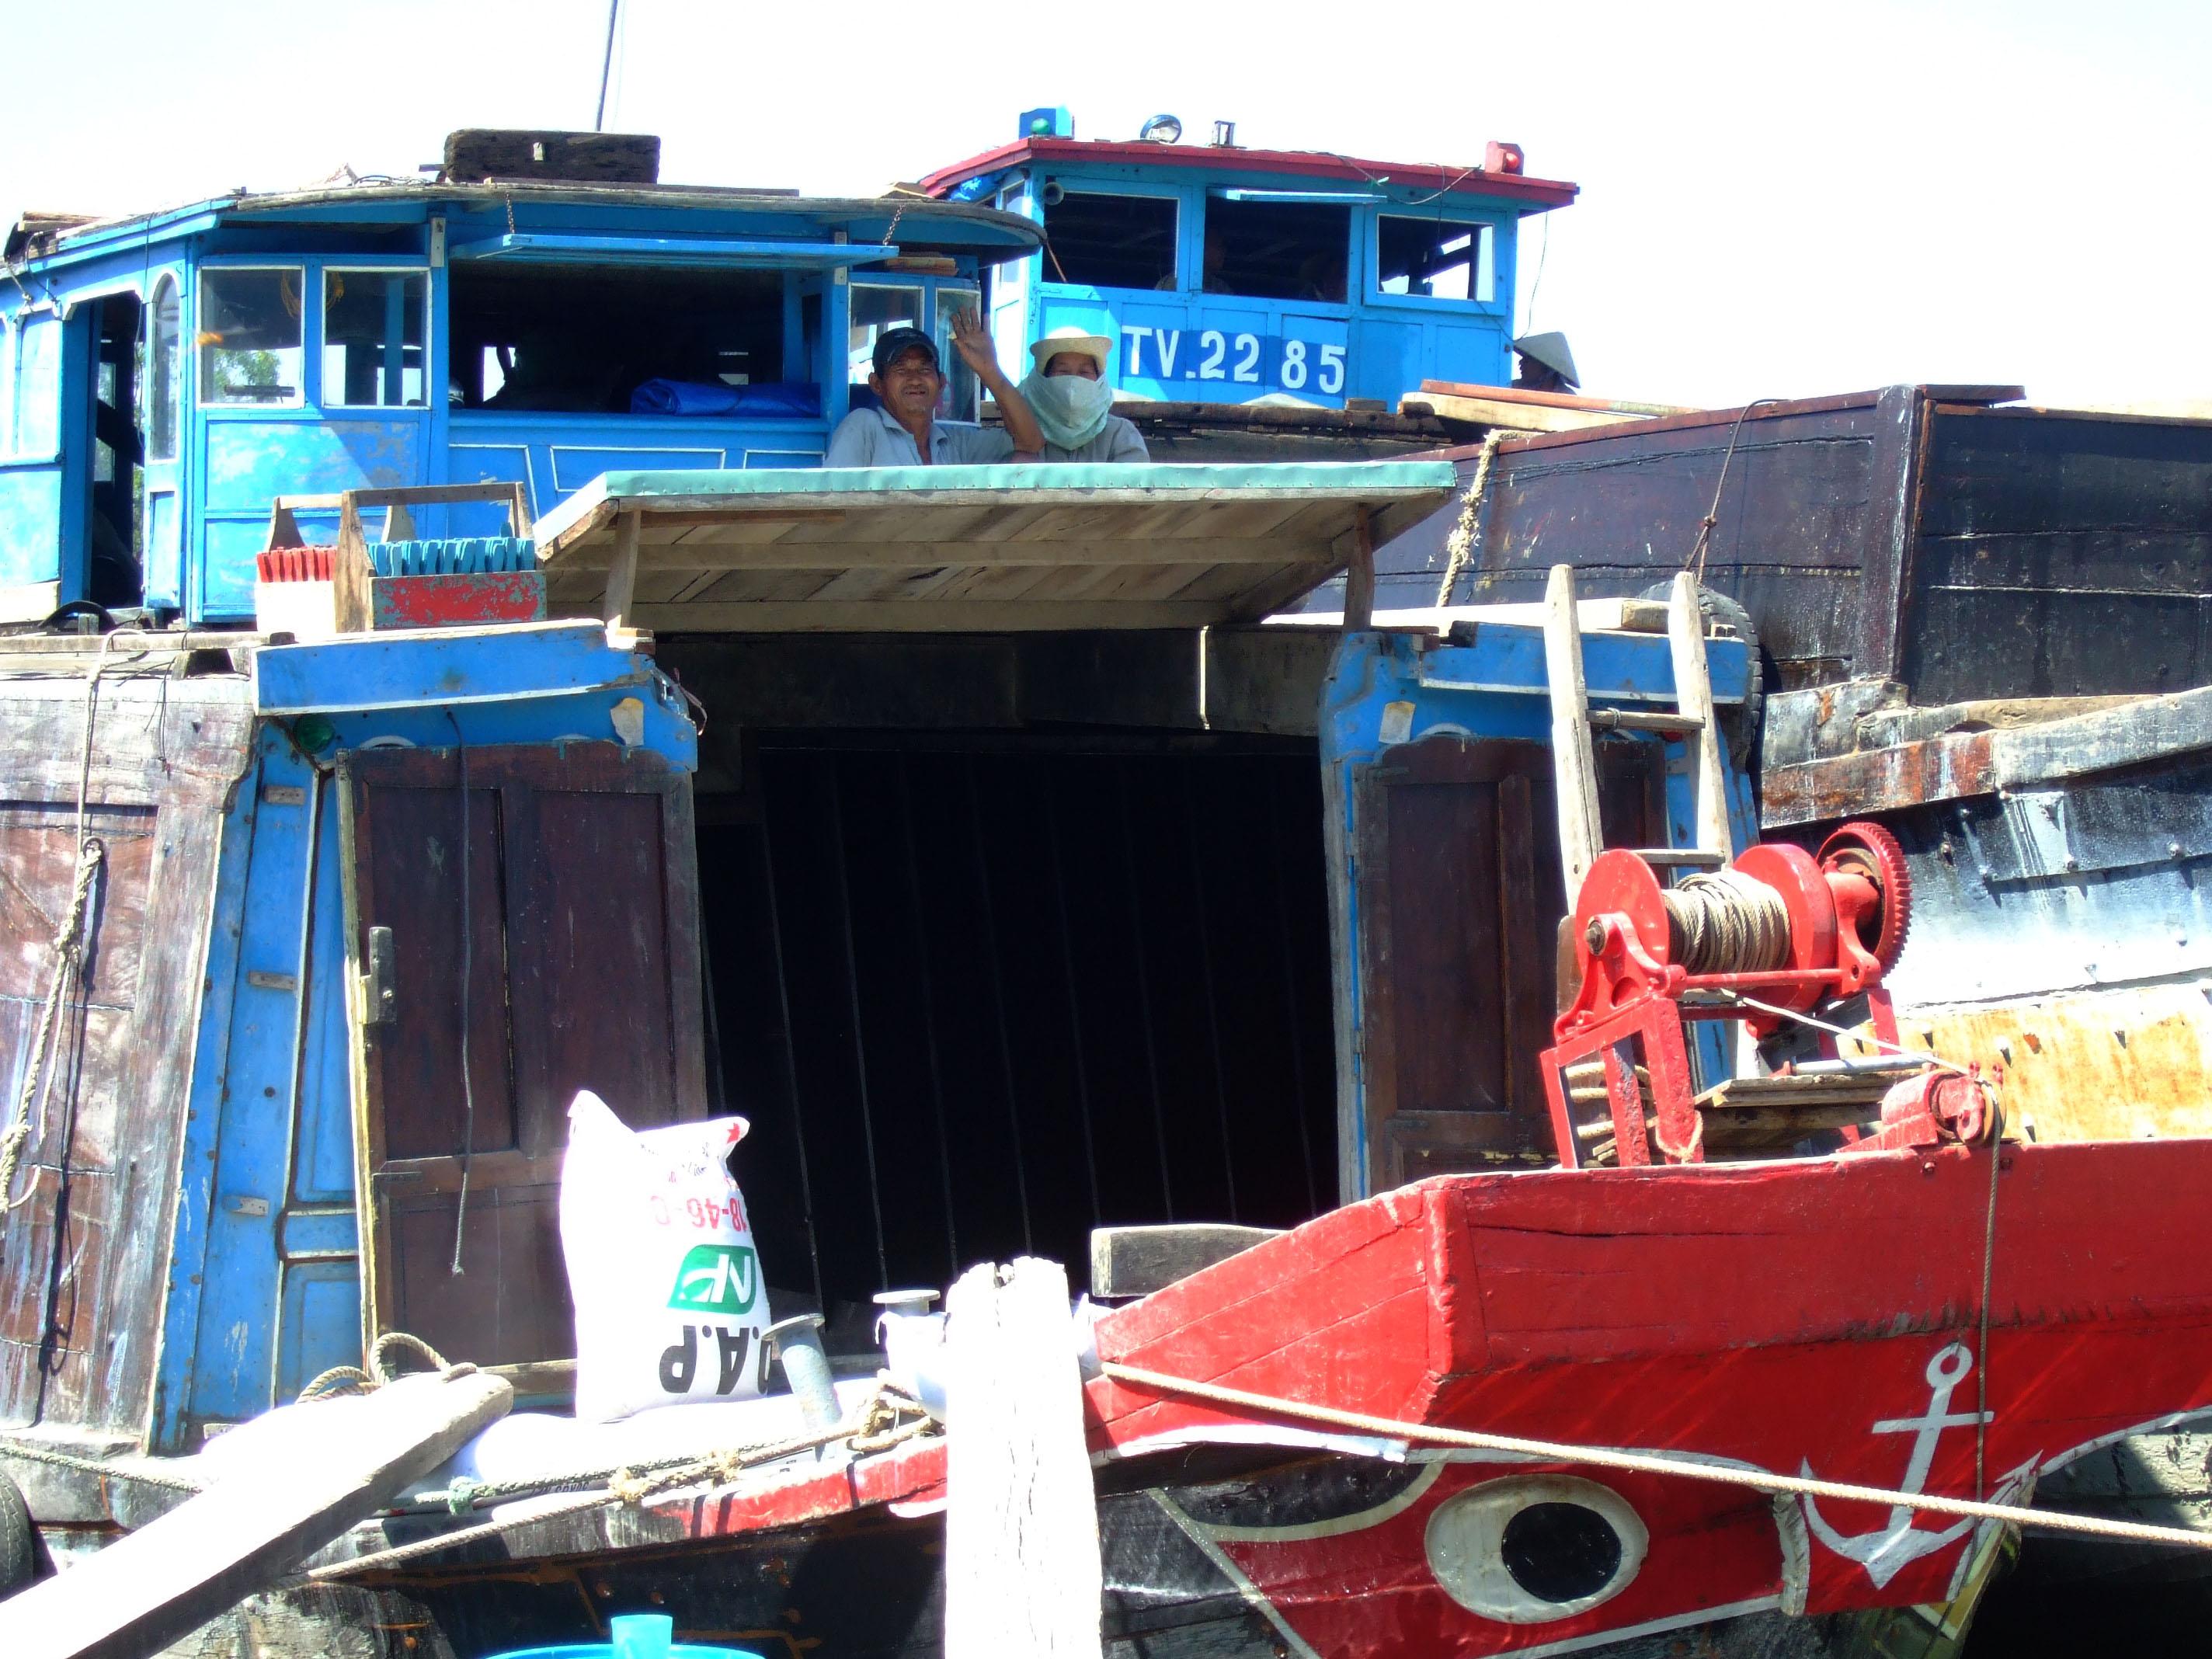 Vietnam Ho Chi Minh City Saigon harbor Ferries boats Feb 2009 21